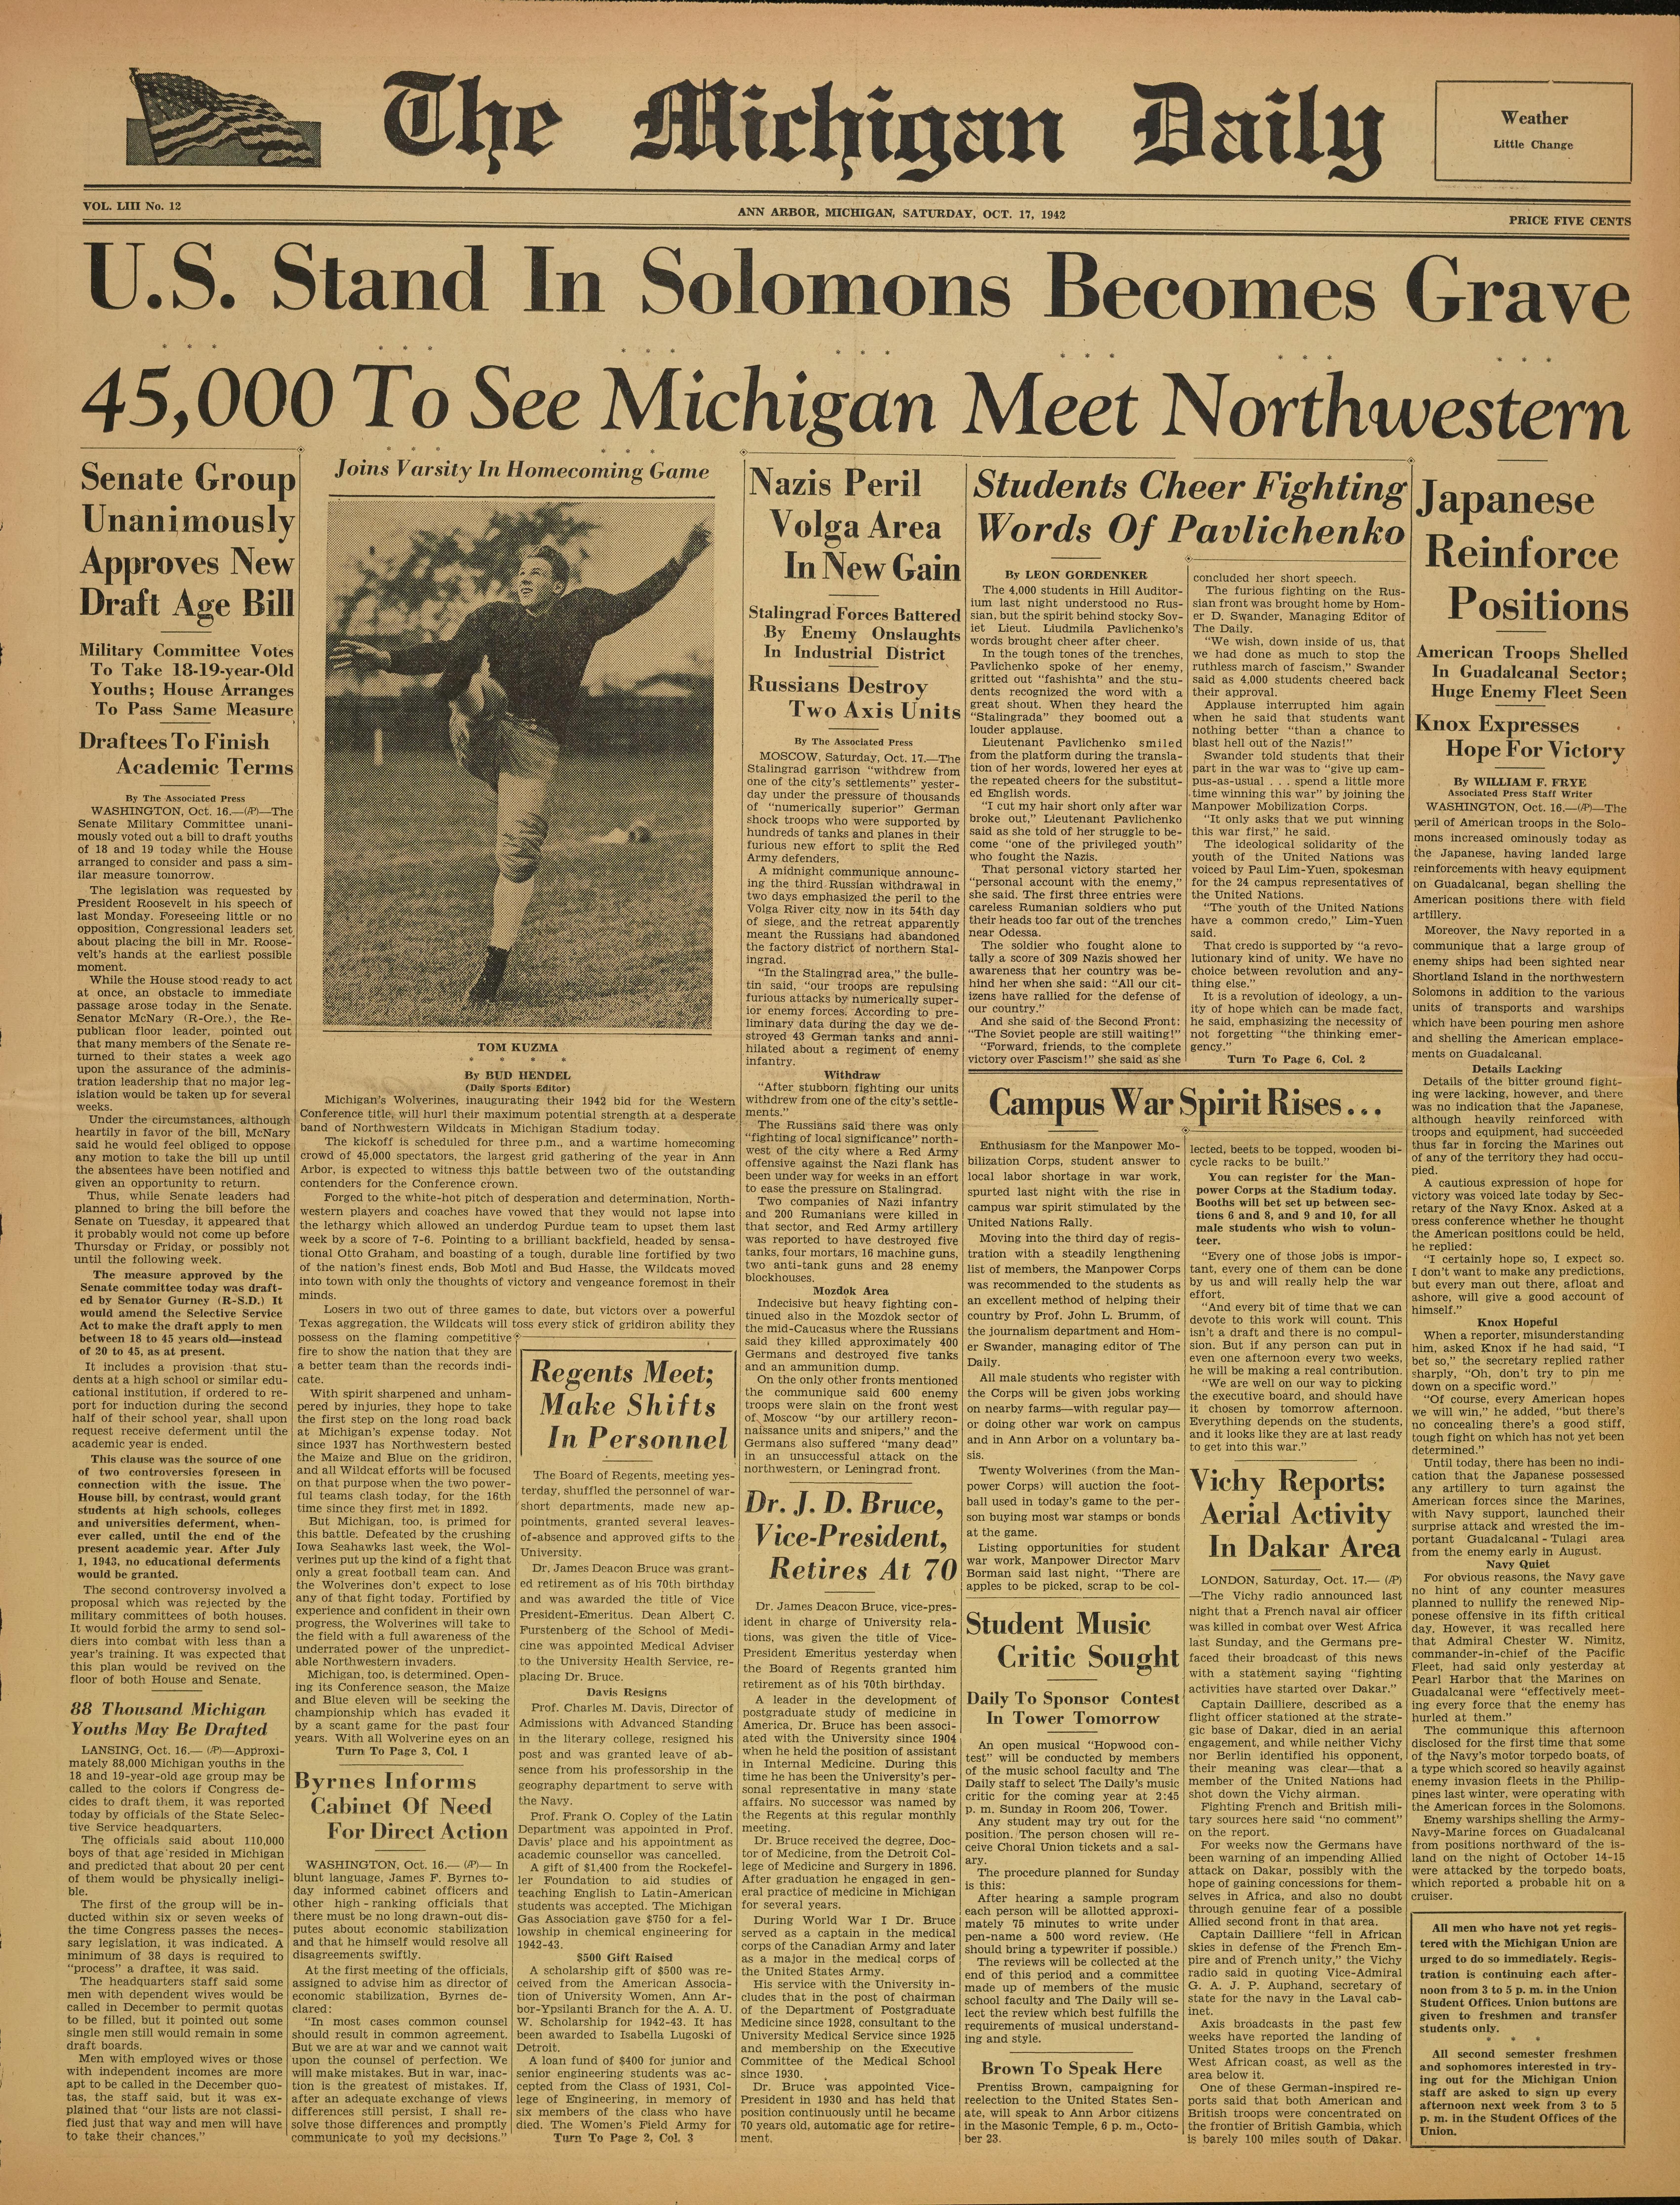 Michigan Daily Digital Archives - October 17, 1942 (vol  53